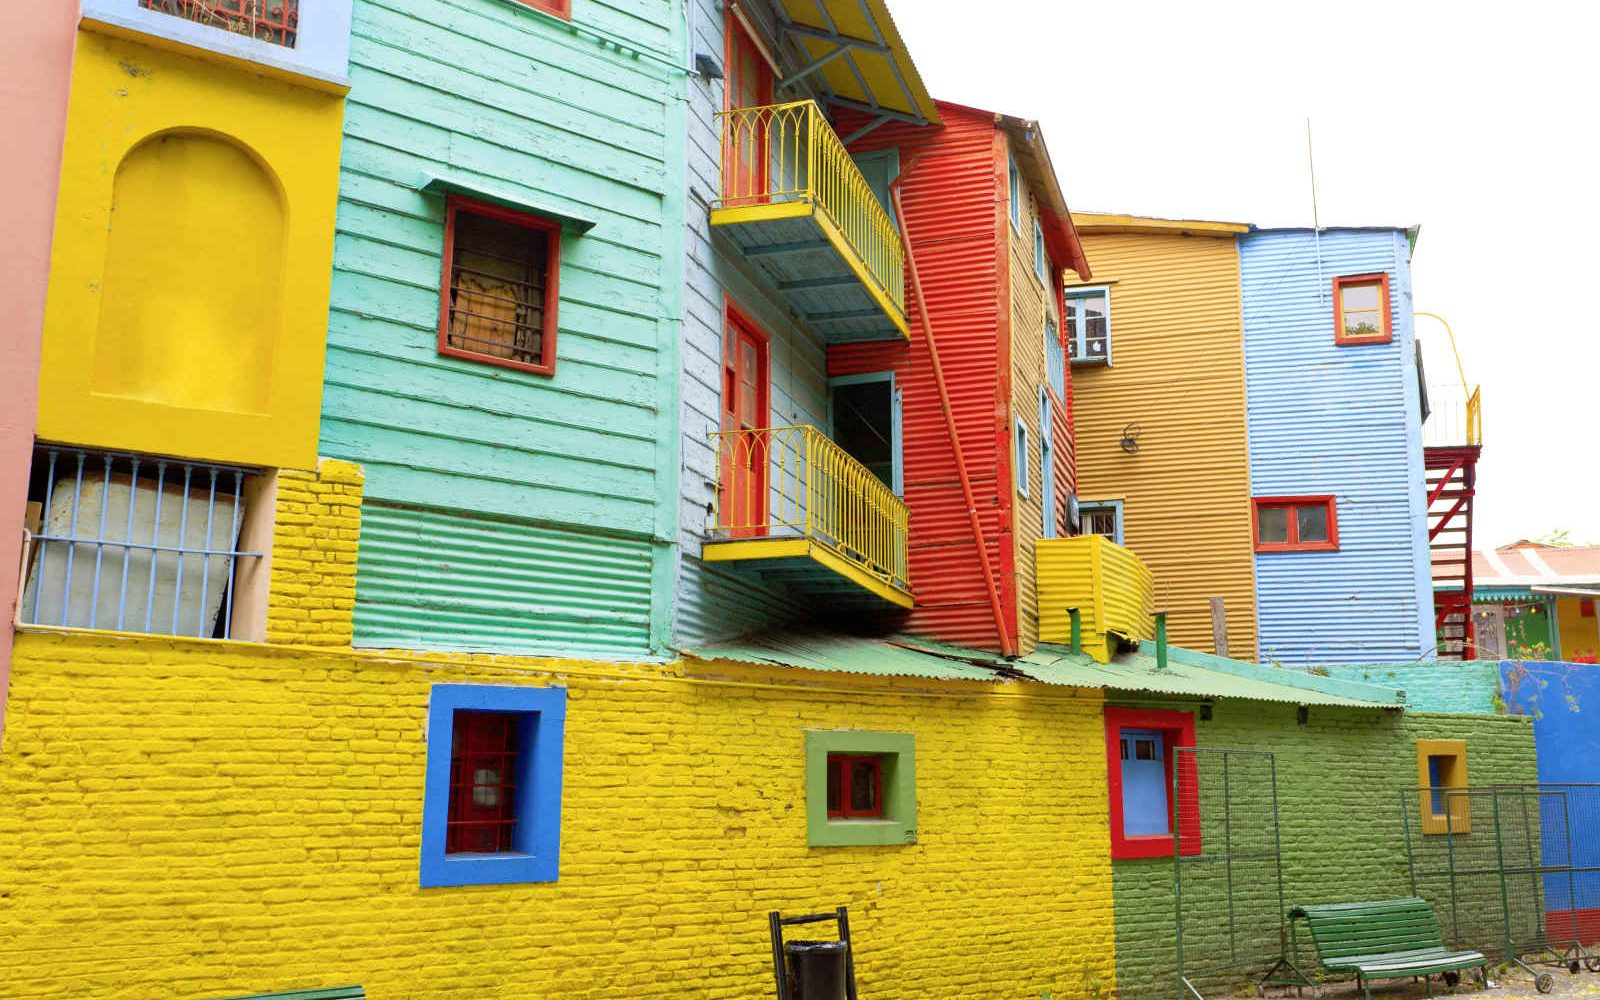 Caminito street, quartier de La Boca, Buenos Aires, Argentine